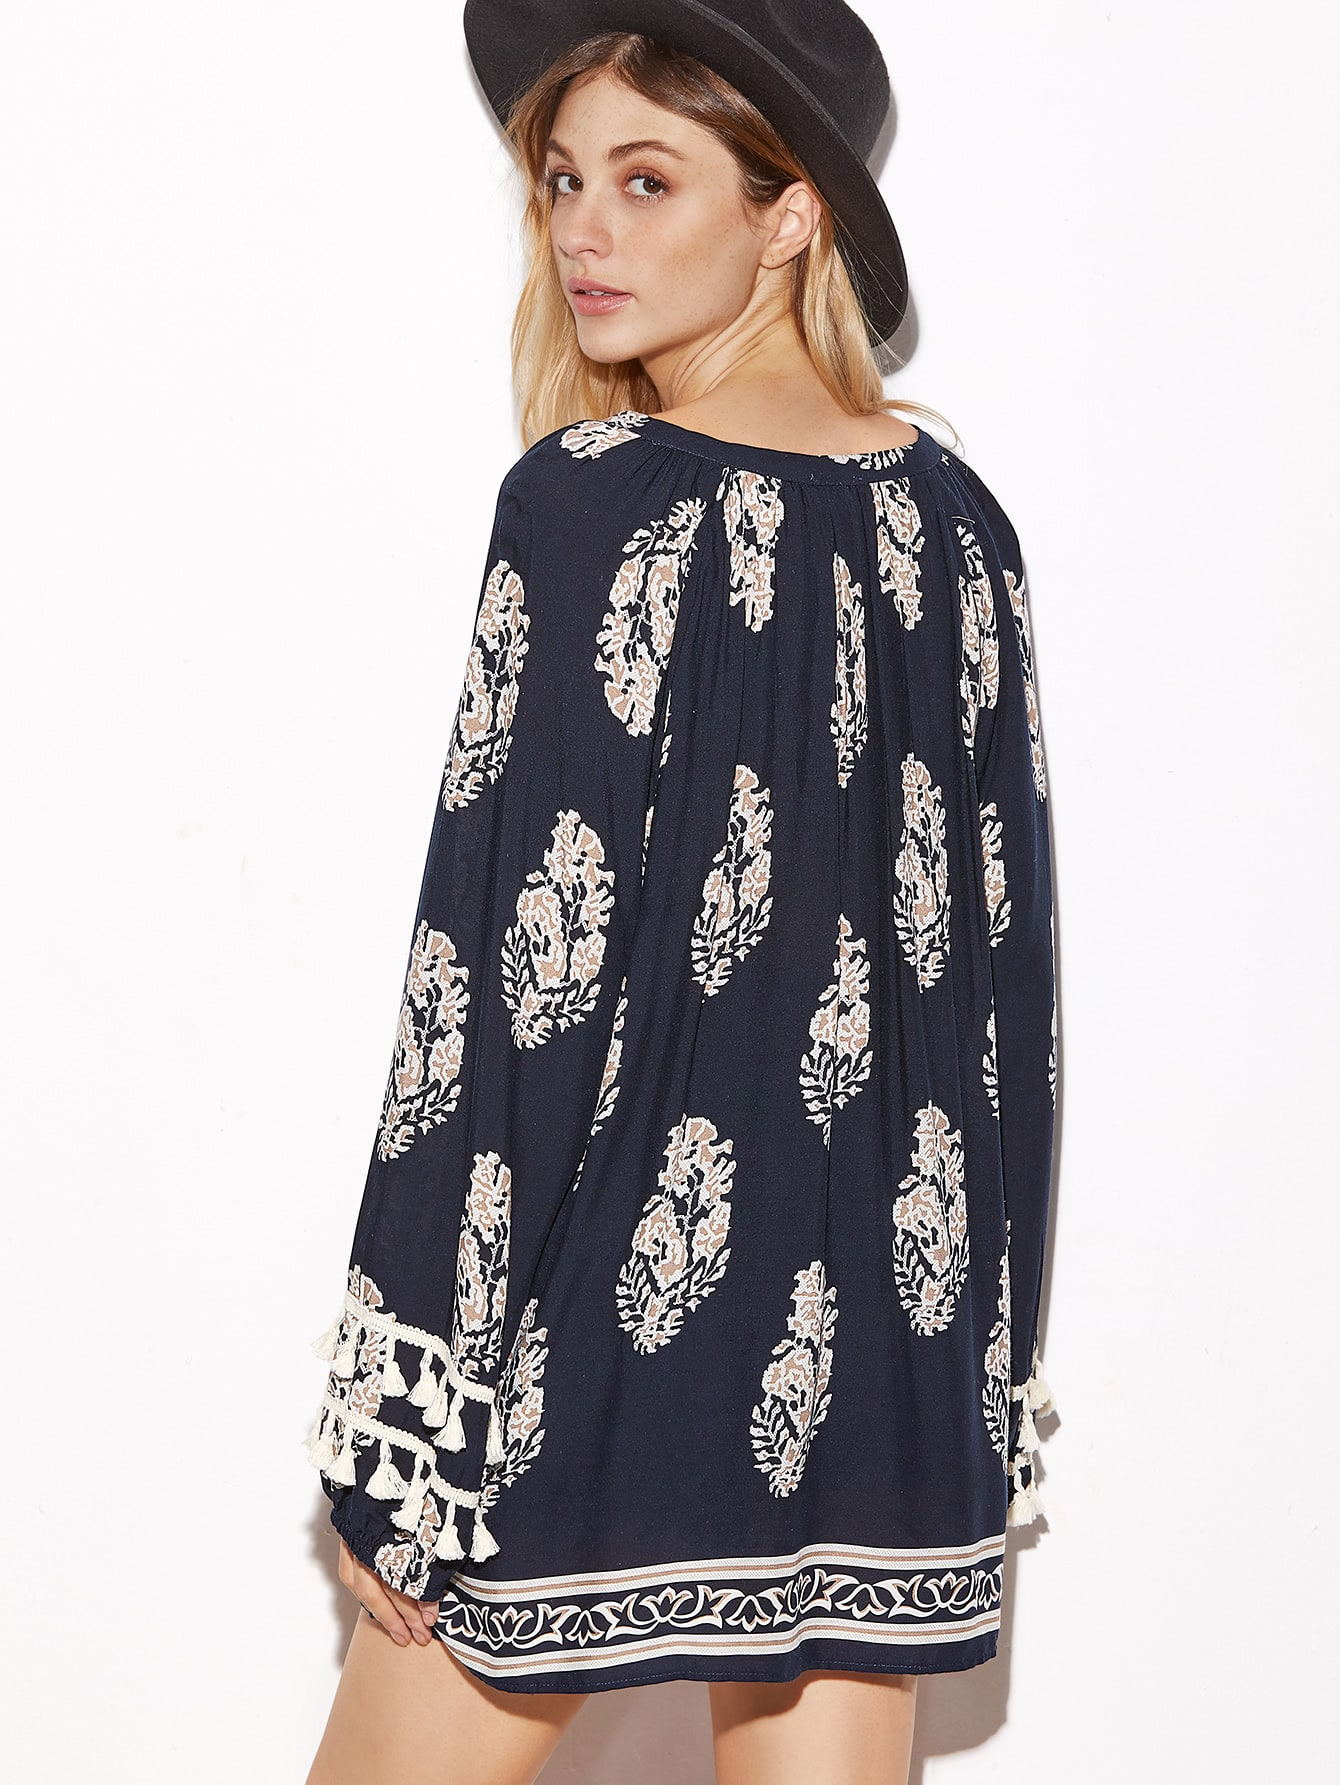 blouse161108003_2